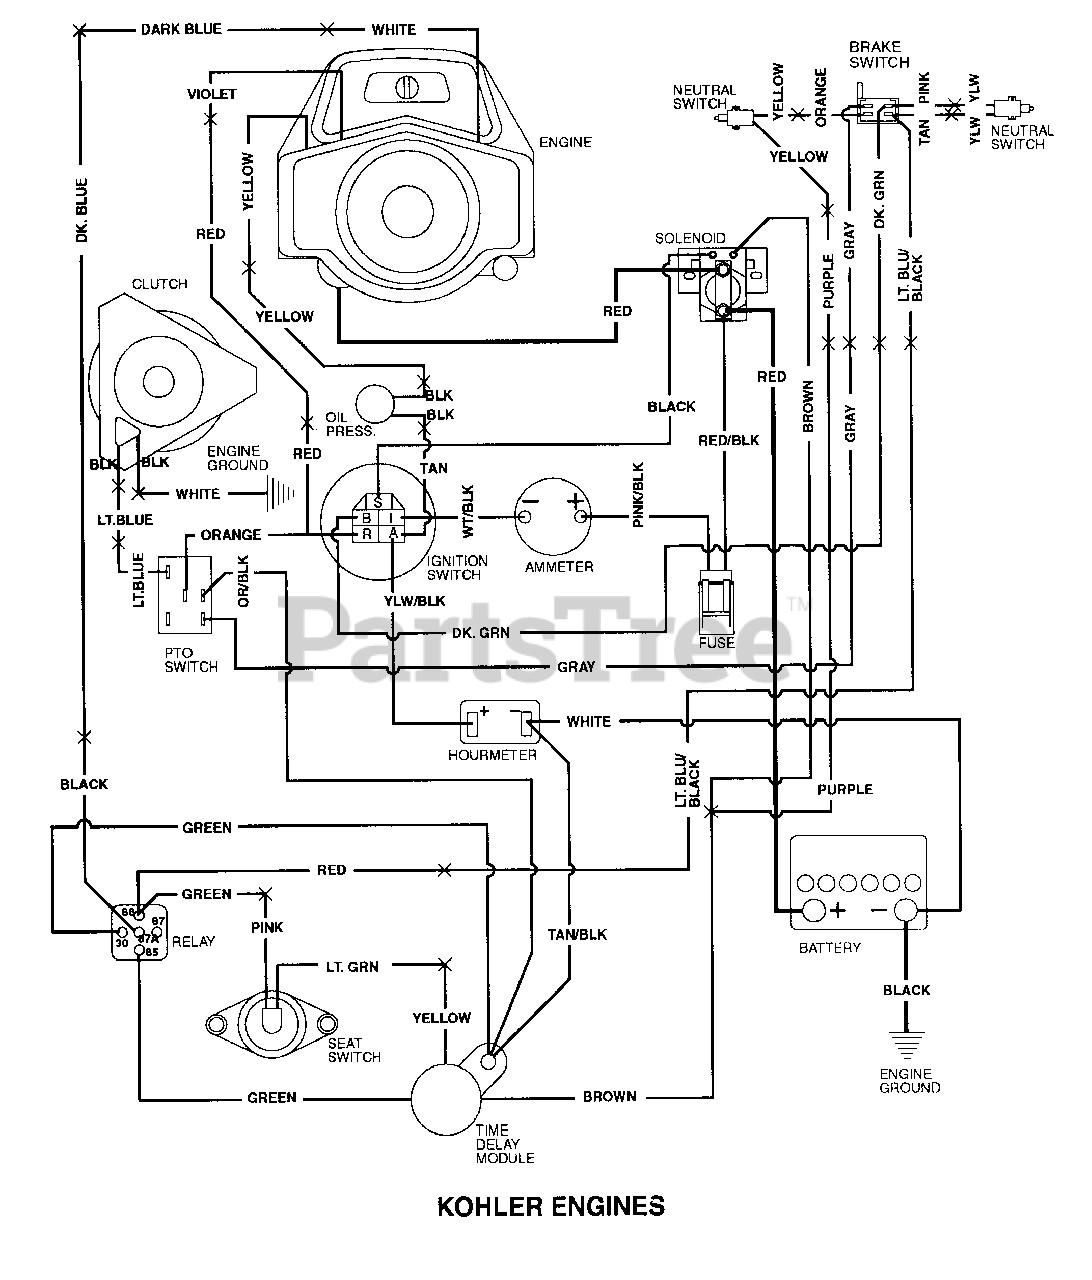 Gravley Mowers 991026 Wireing Gravely Pm 300 Gravely Pro Master Zero Turn Mower 20hp Kohler Sn & Of Gravley Mowers 991026 Wireing